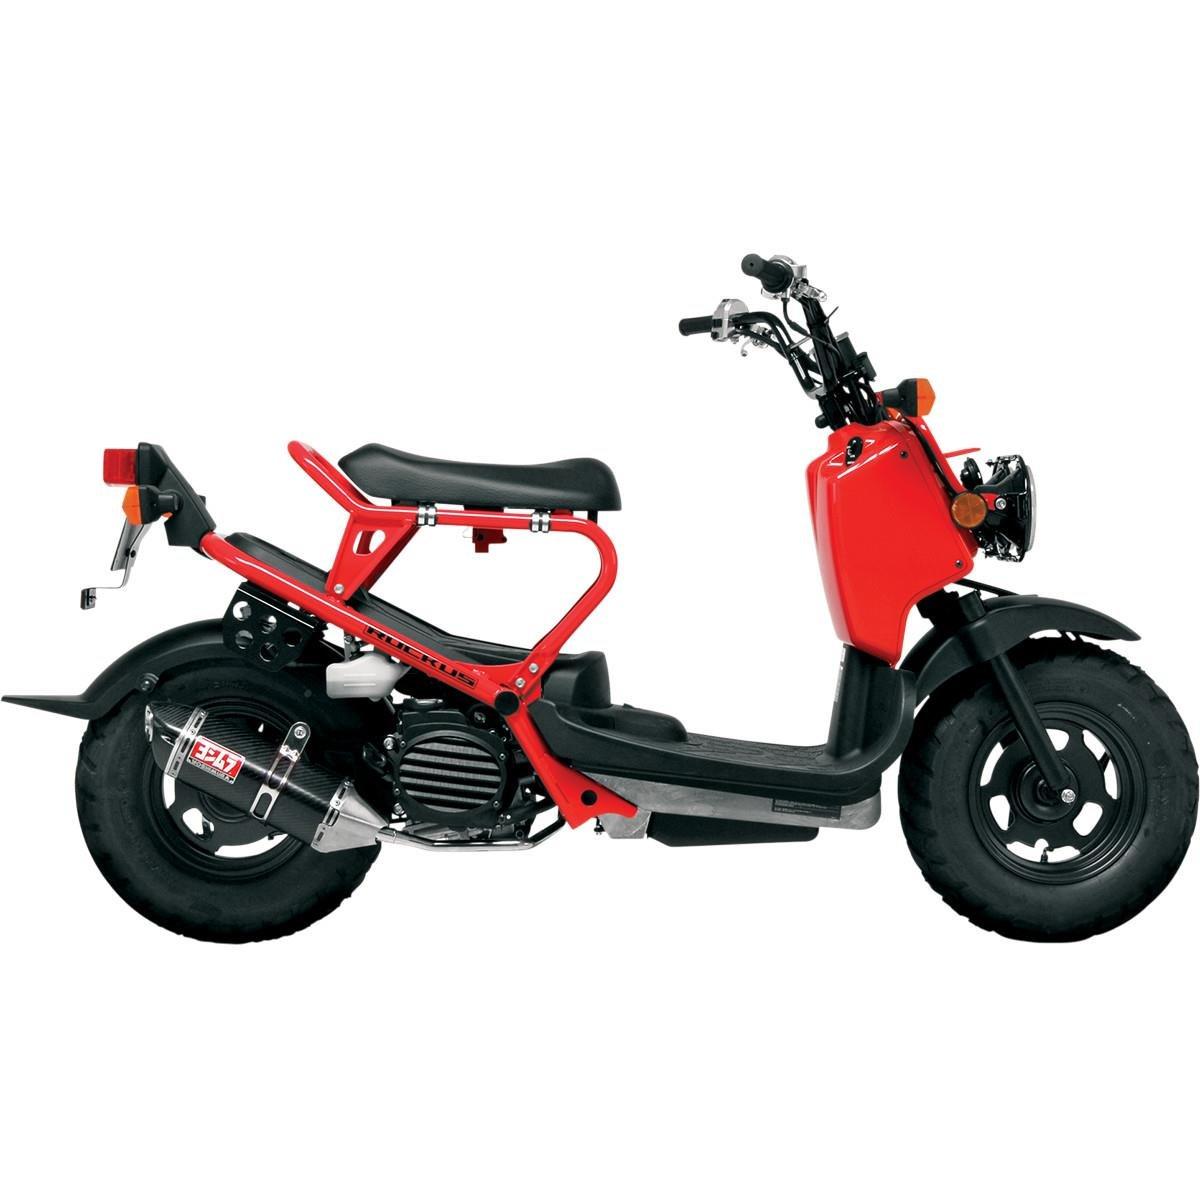 Yoshimura TRC Full System Exhaust (Race/Stainless Steel/Carbon Fiber/Carbon Fiber)